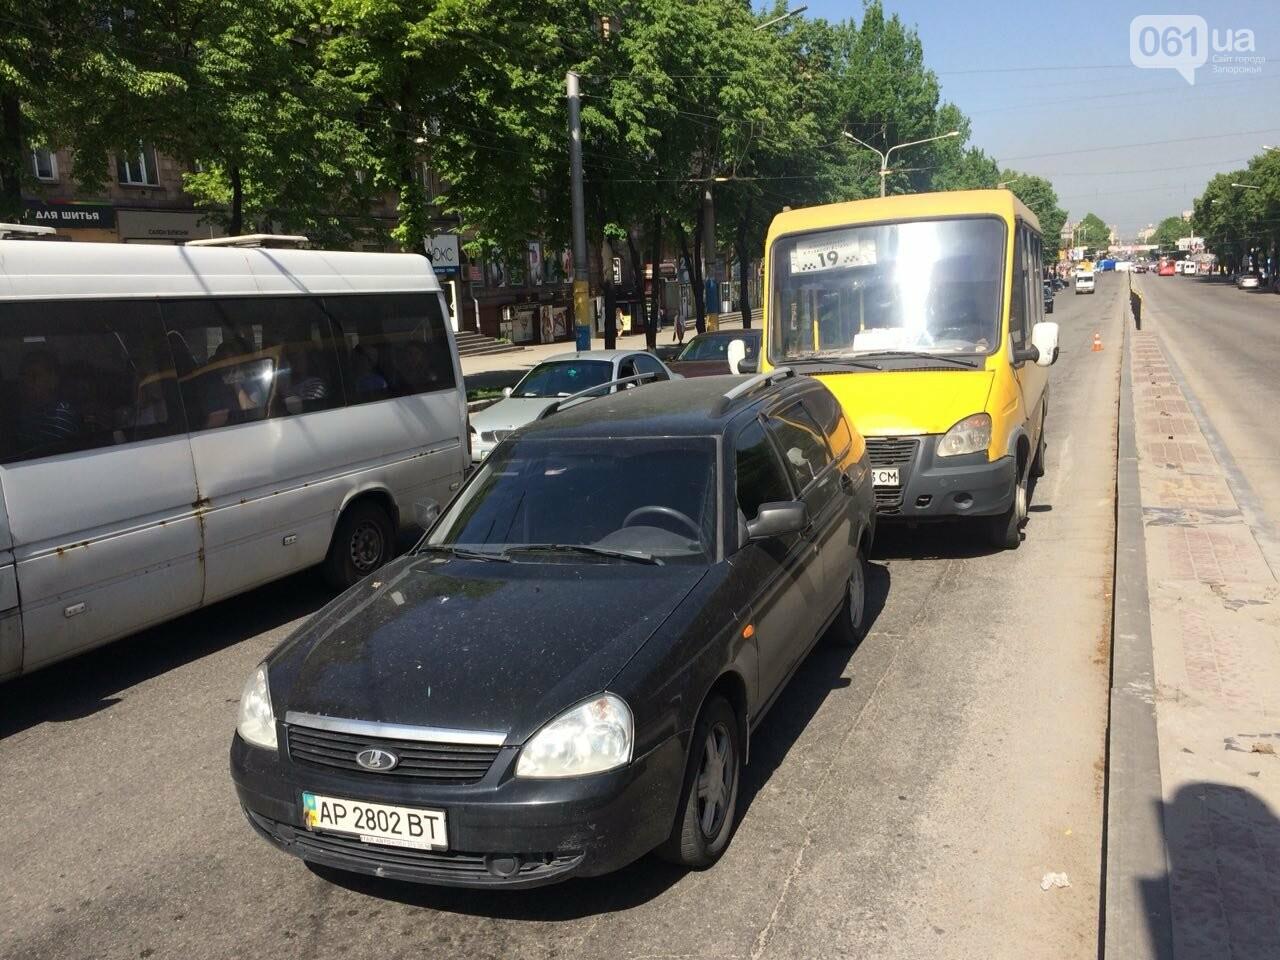 В центре Запорожья маршрутчик въехал в легковое авто, - ФОТО, фото-1